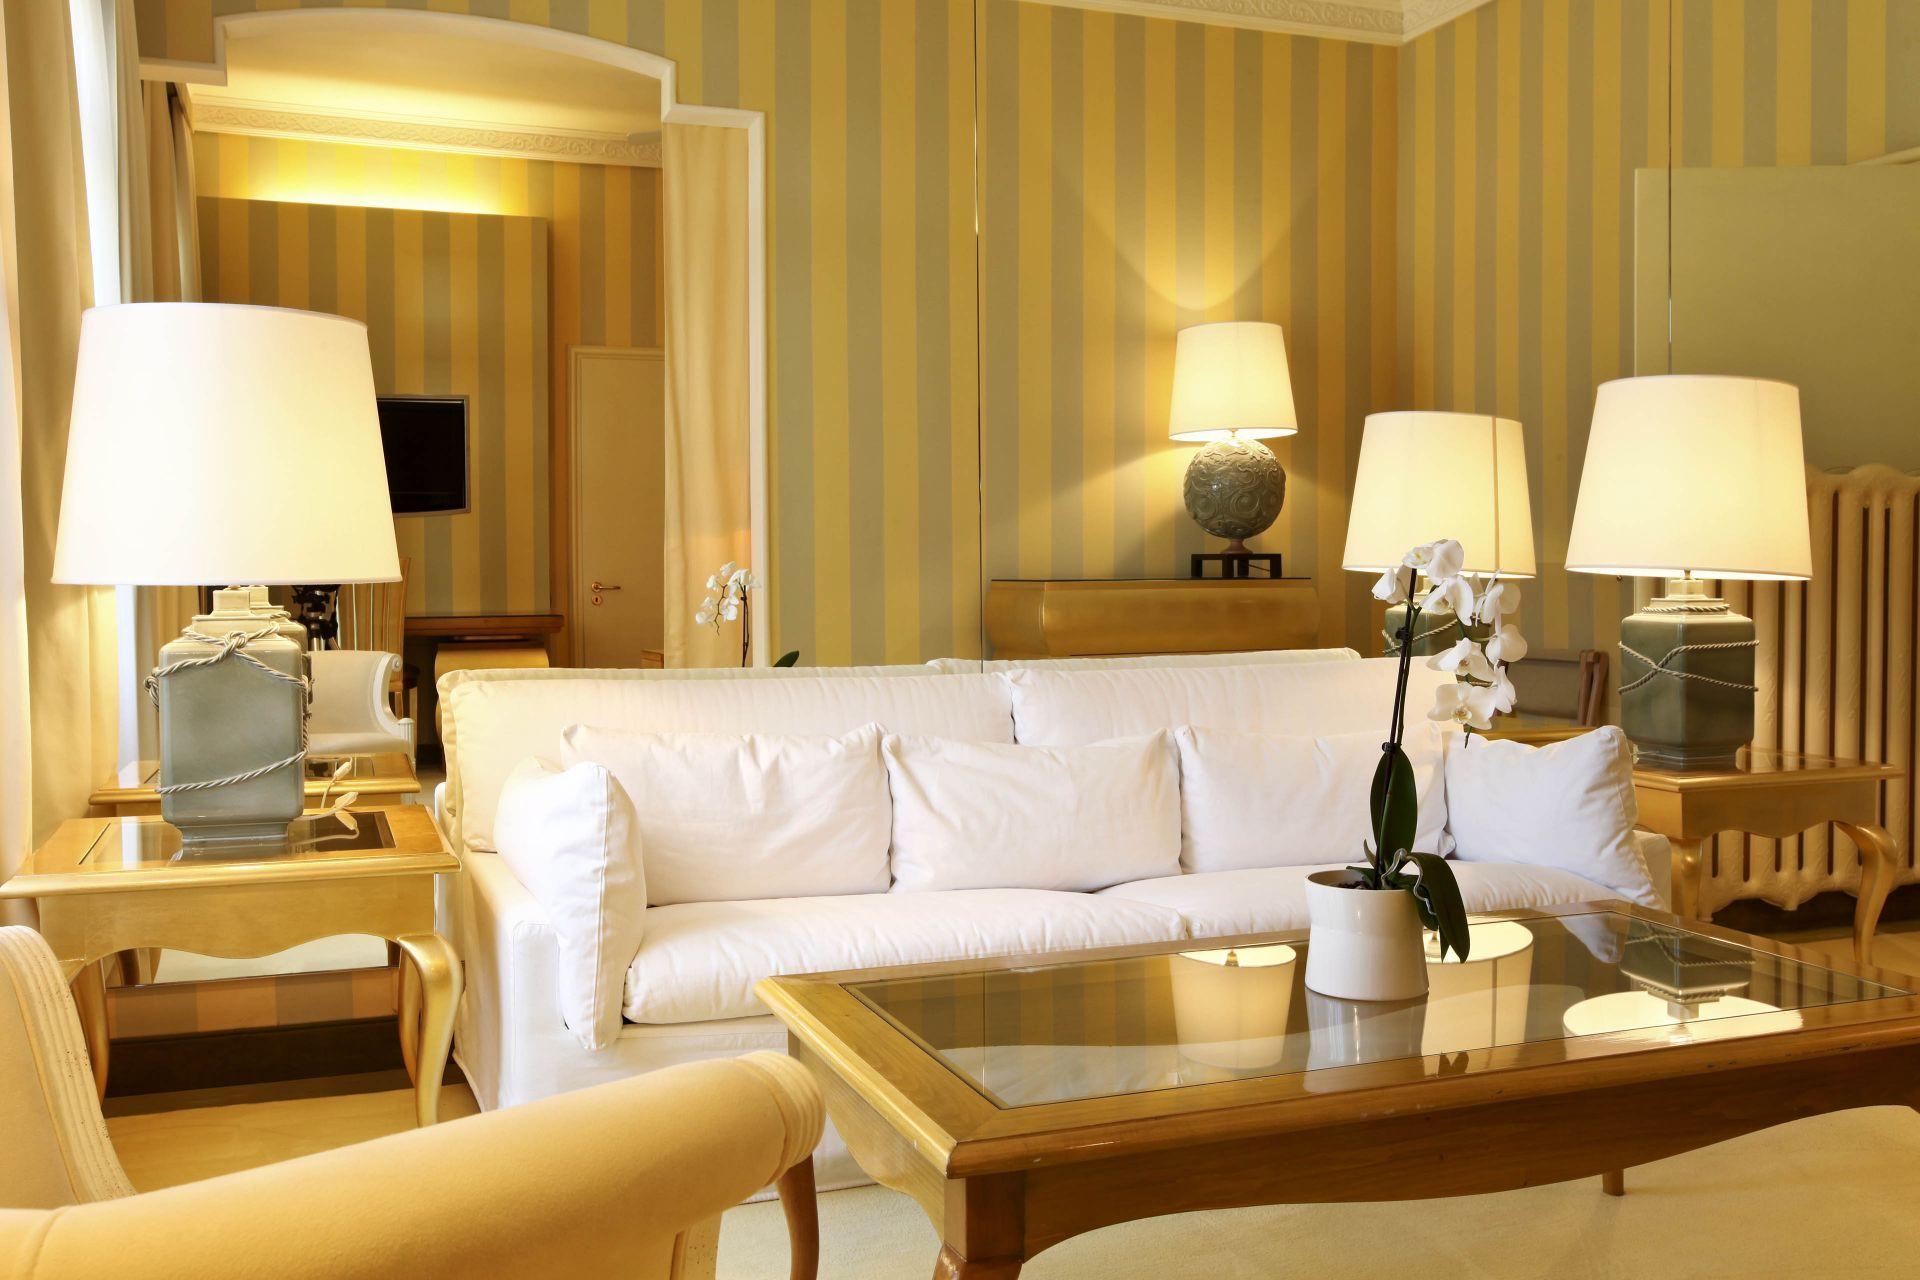 Suites in Greece